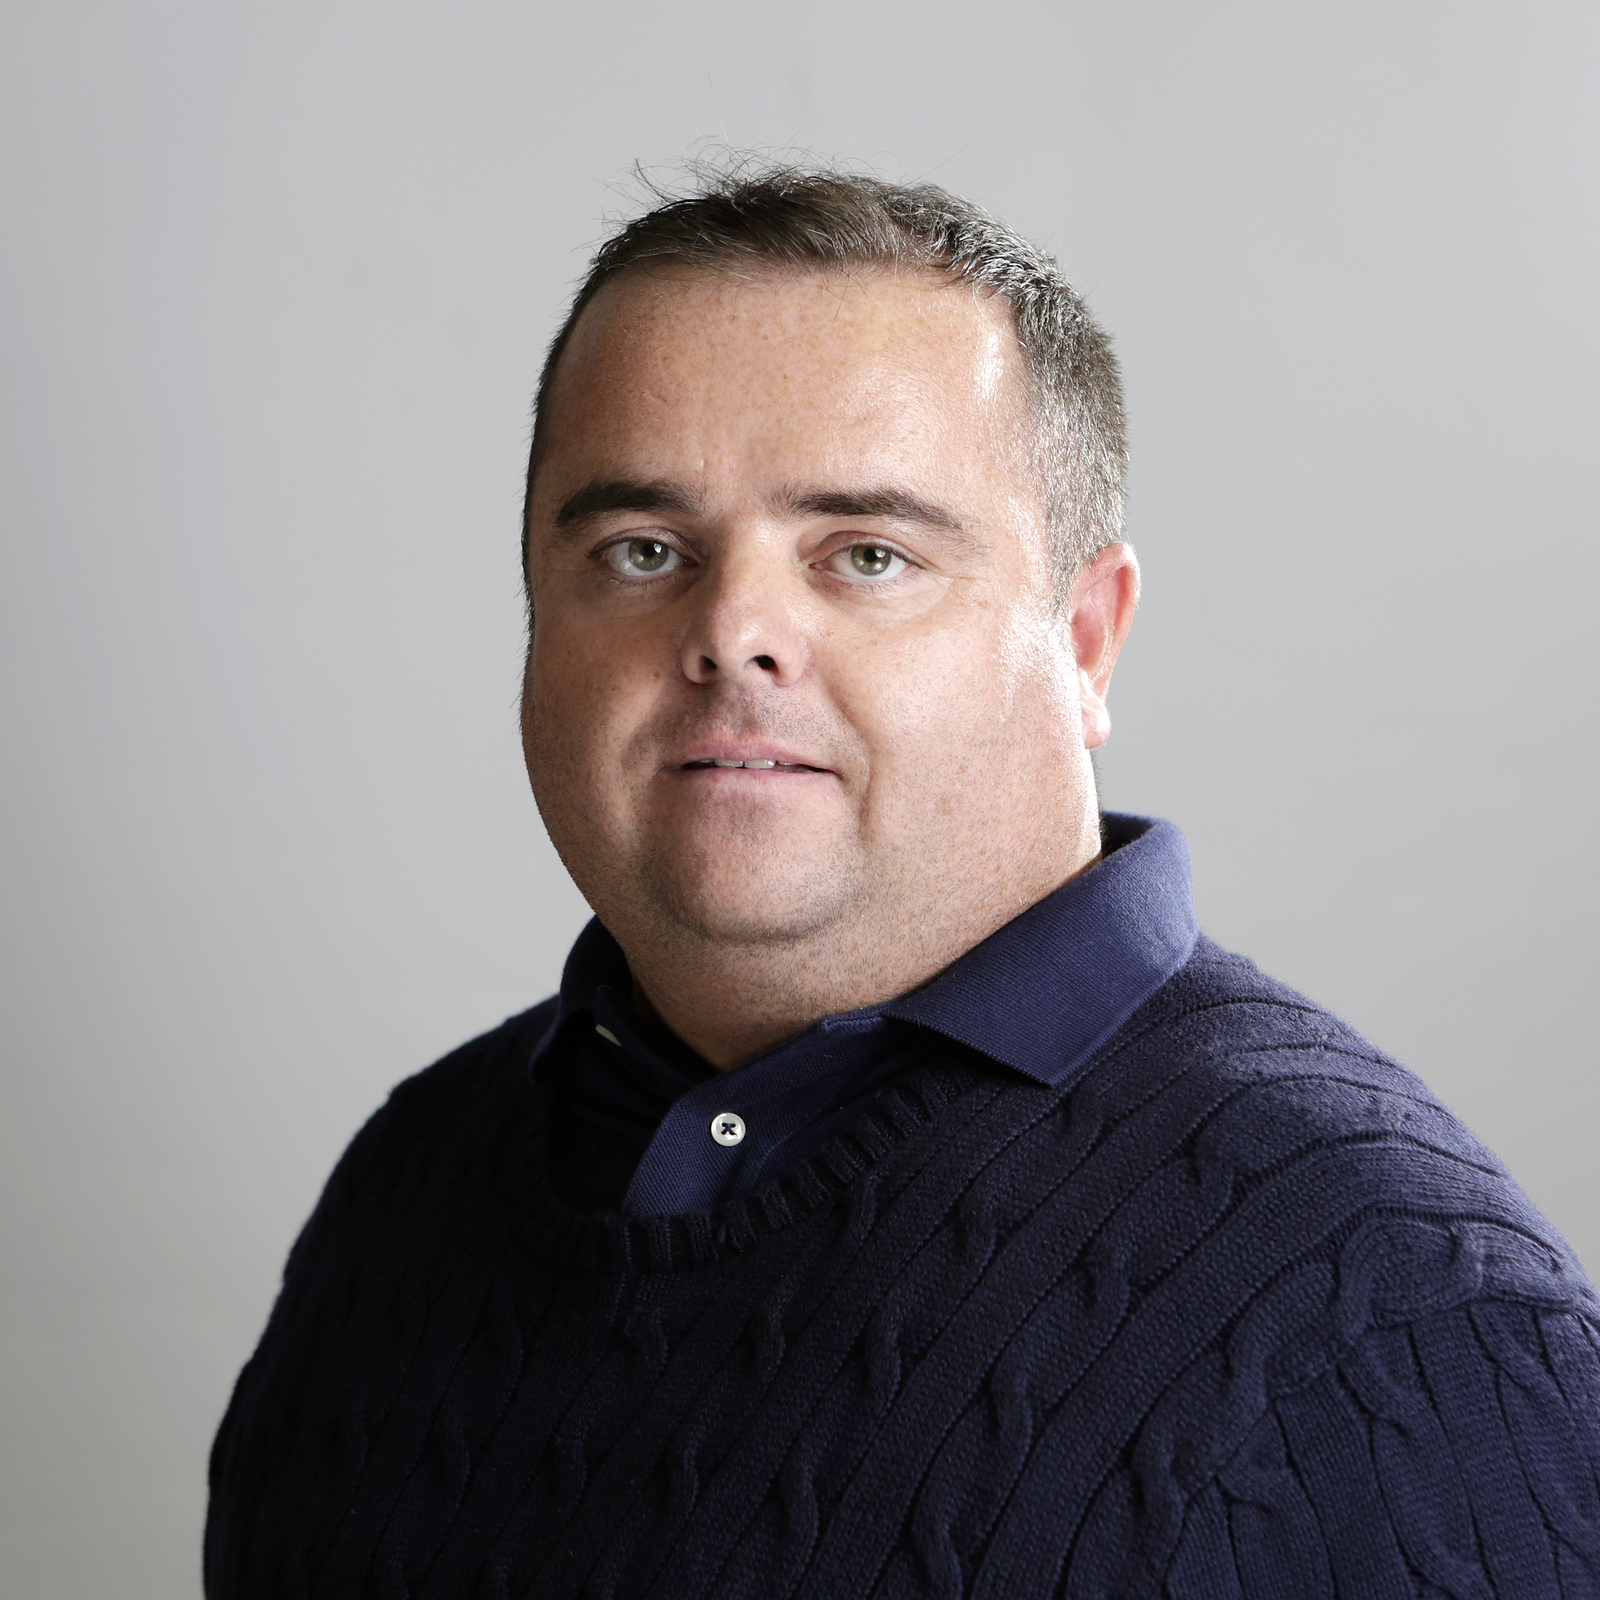 Craig Campbell Scottish Digital Marketing Expert